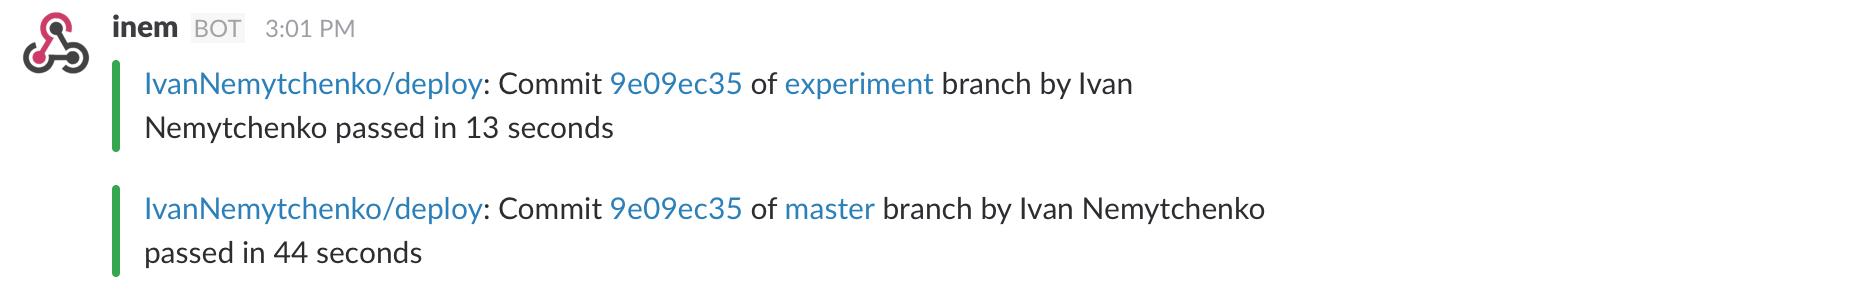 Deployment notifications in Slack